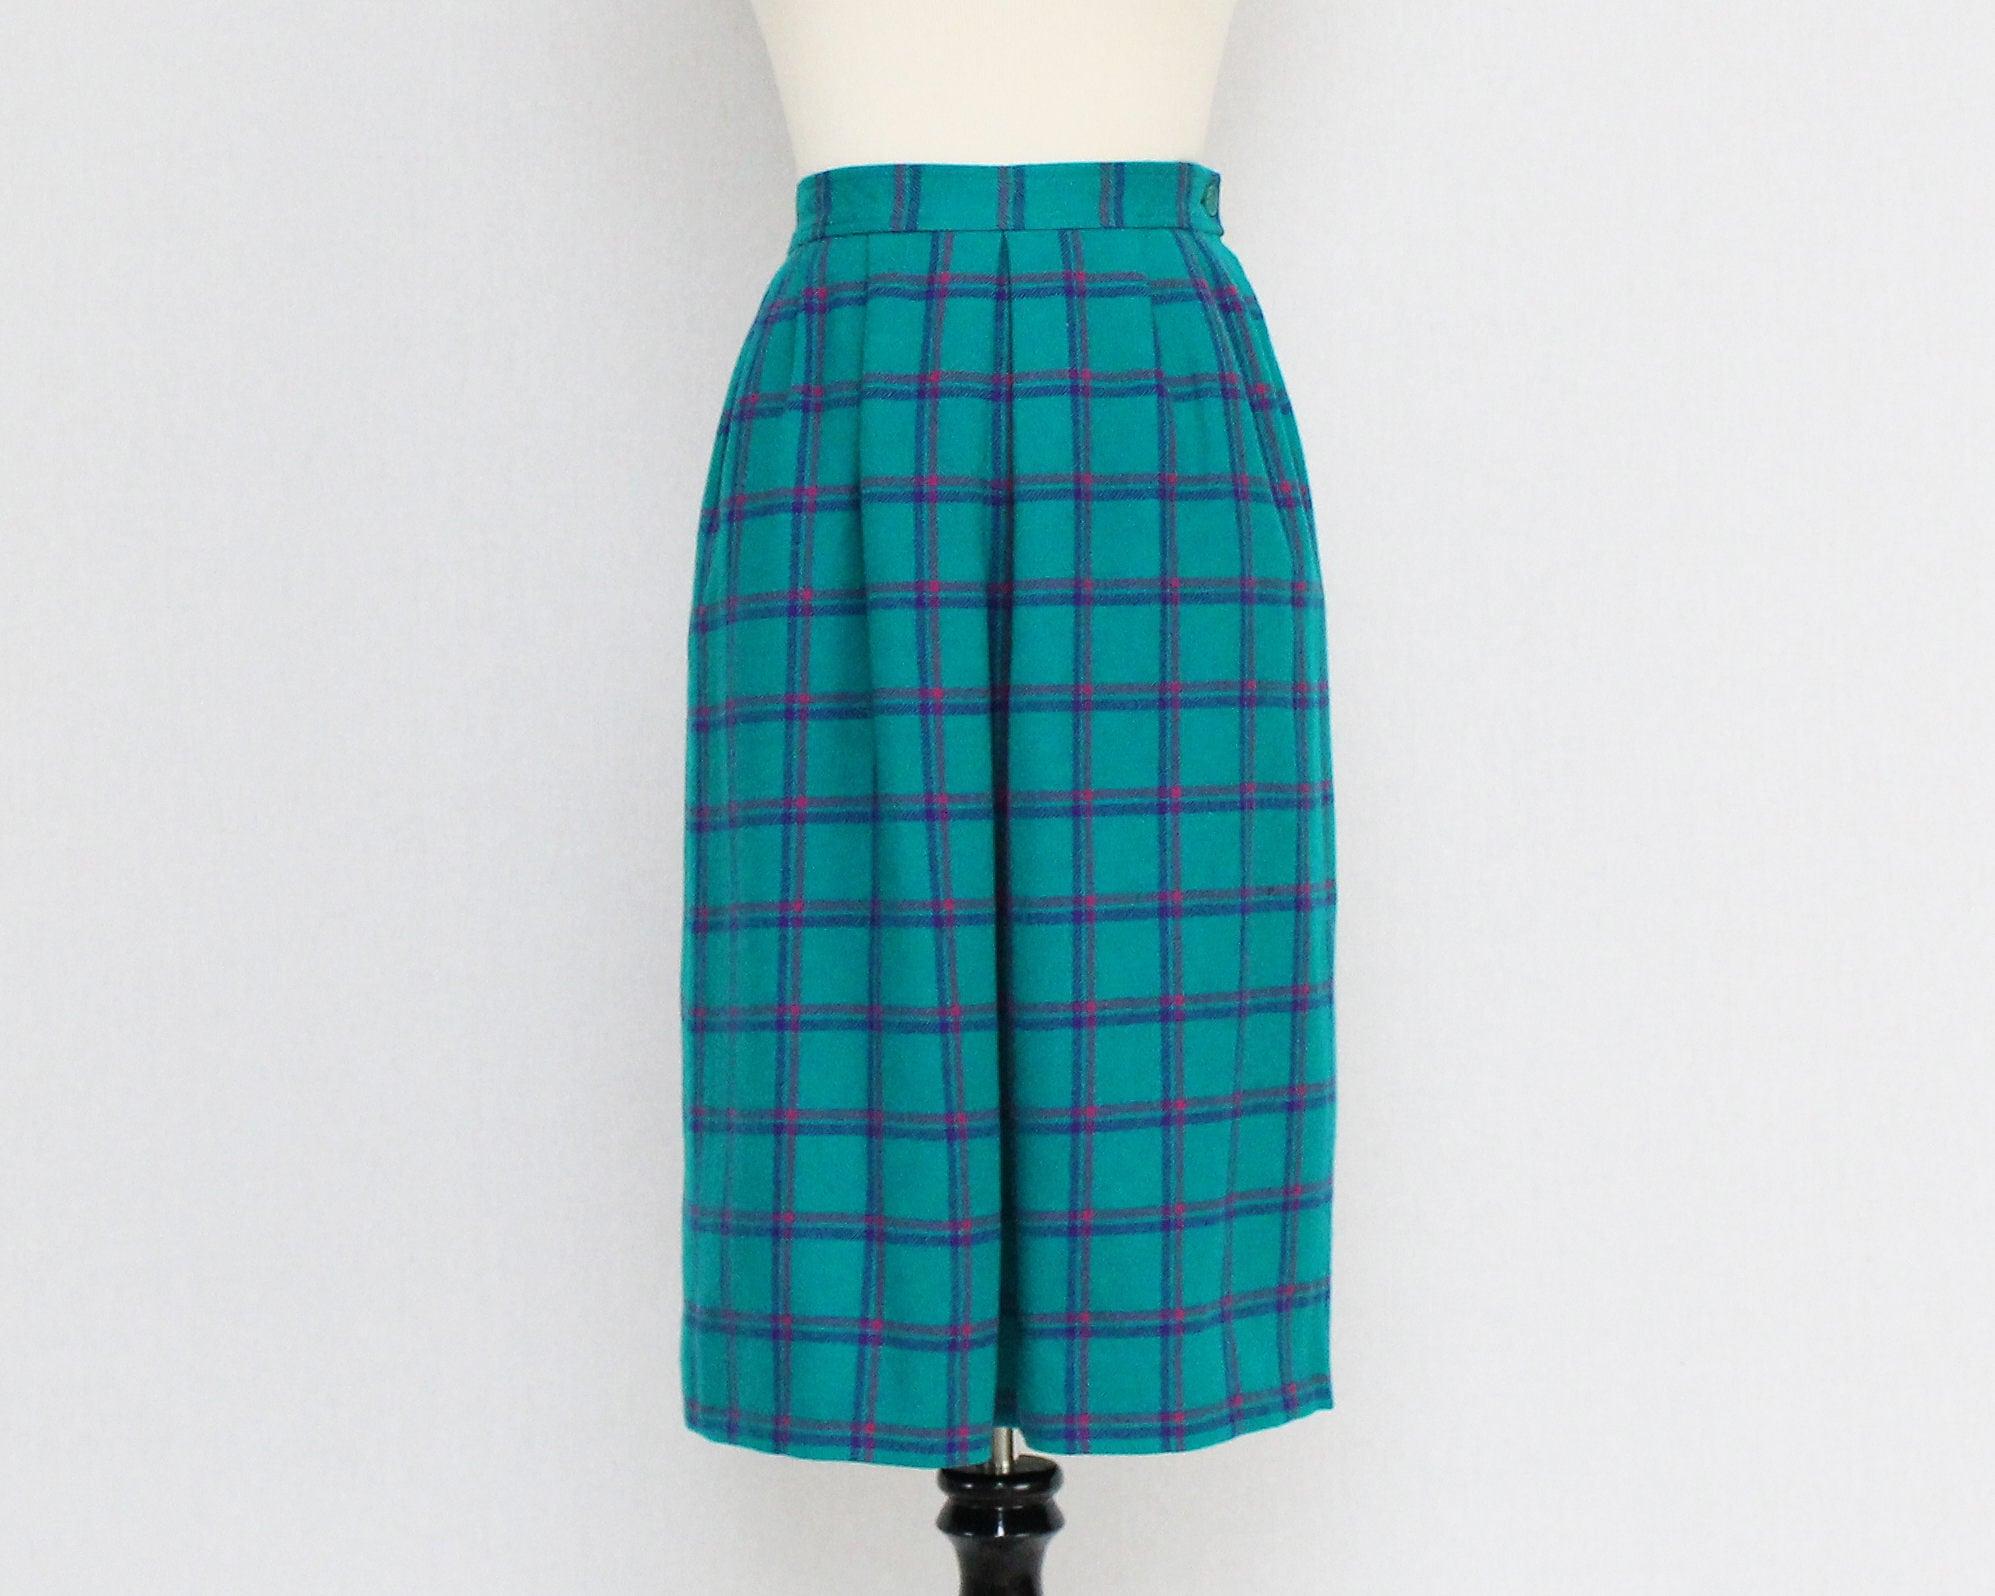 03797ce2f6 Women's Pendleton Petite Tartan Plaid Skirts Pendleton Skirts For Women:  Vintage 1970s Pendleton Teal Plaid Wool Skirt